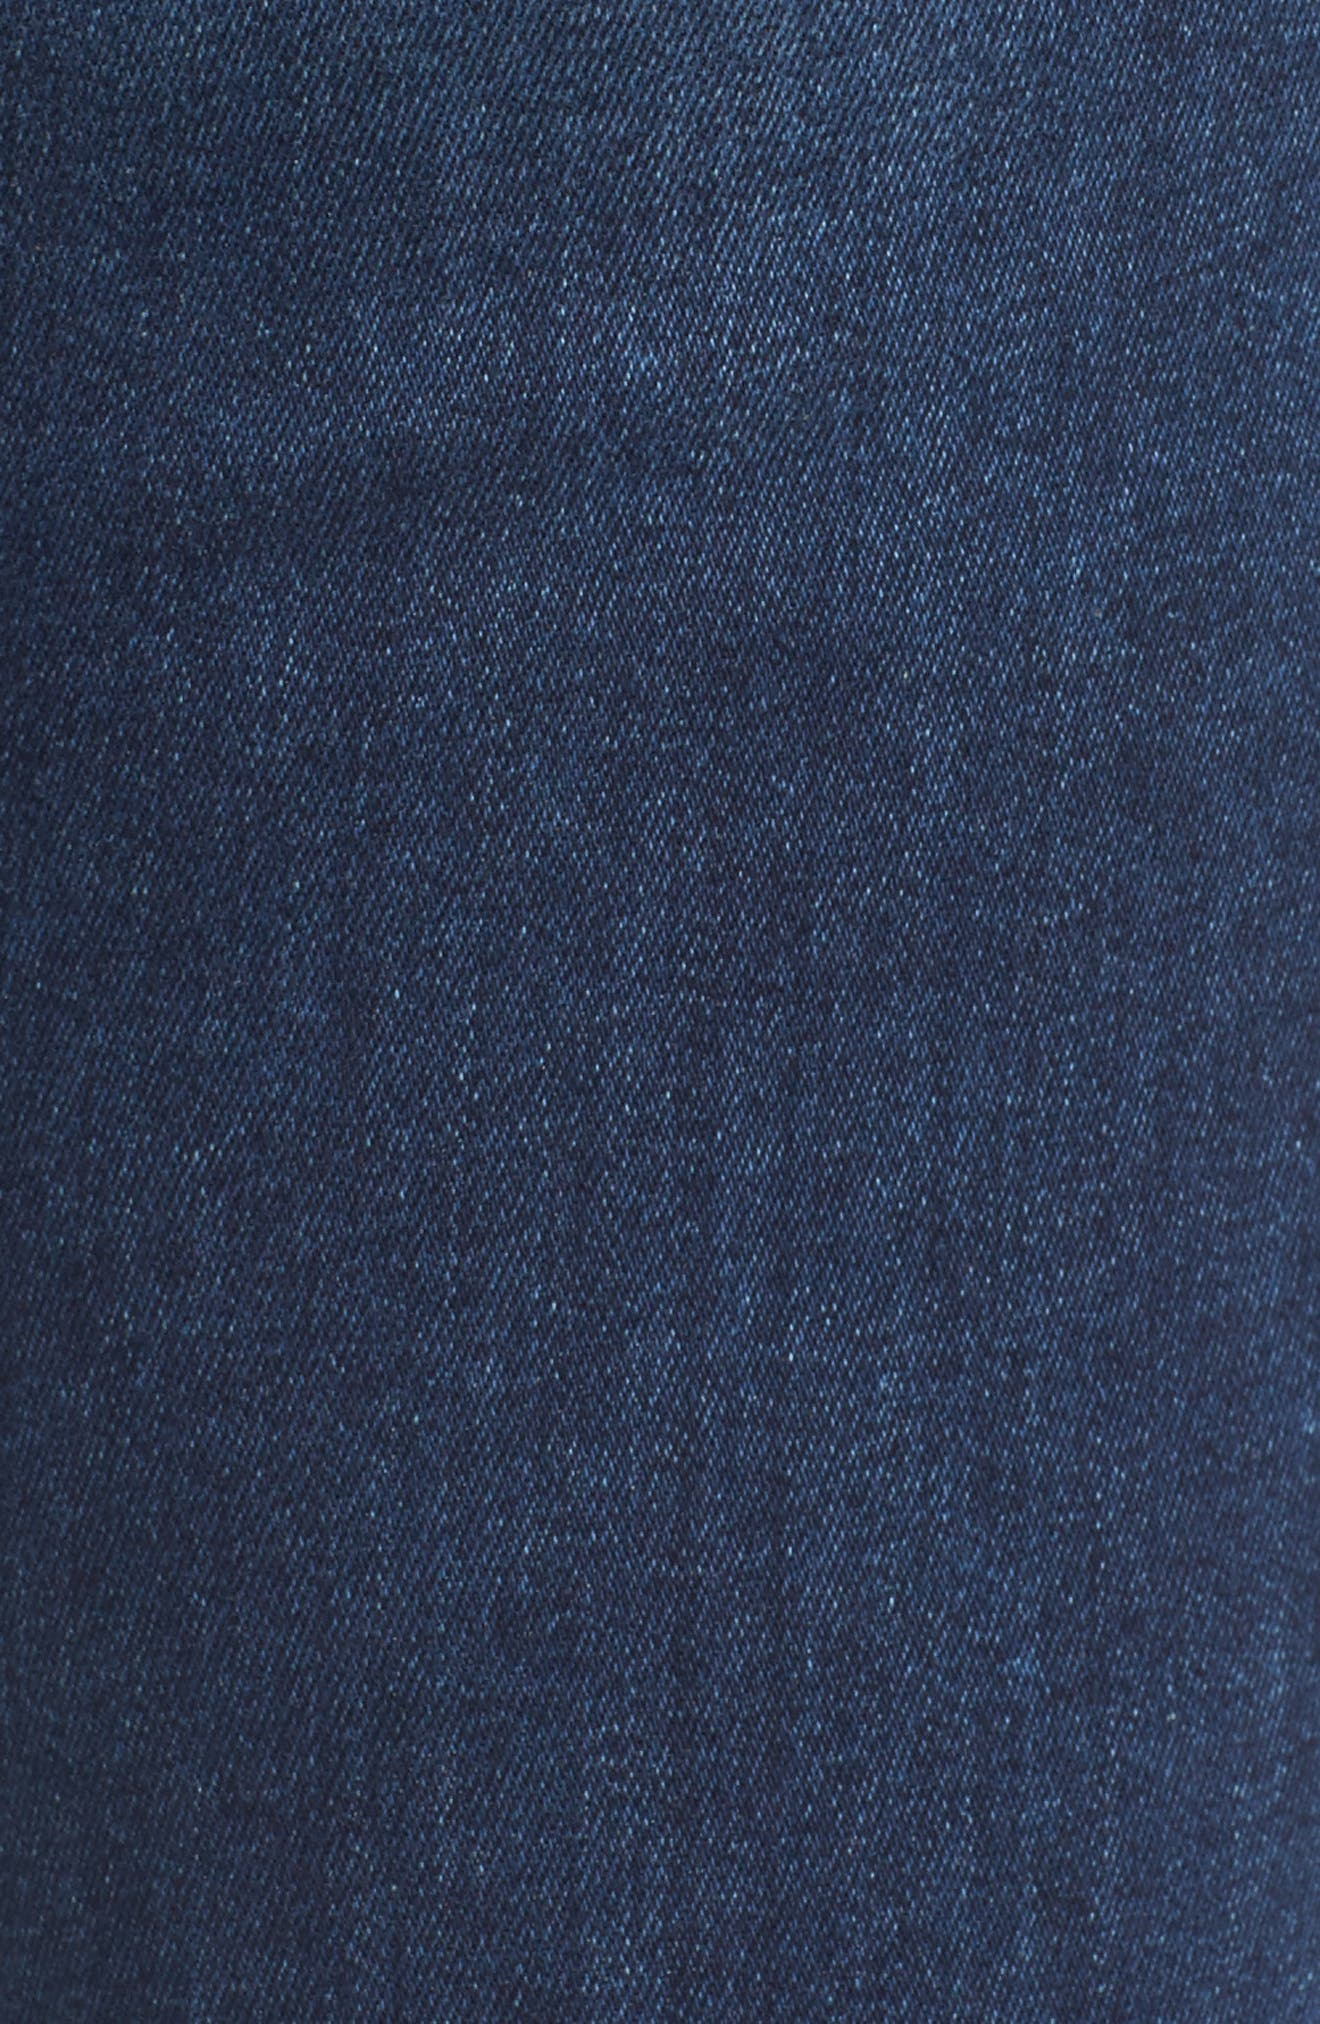 Alternate Image 5  - Fidelity Denim Belvedere Skinny Jeans (Vintage Blue)